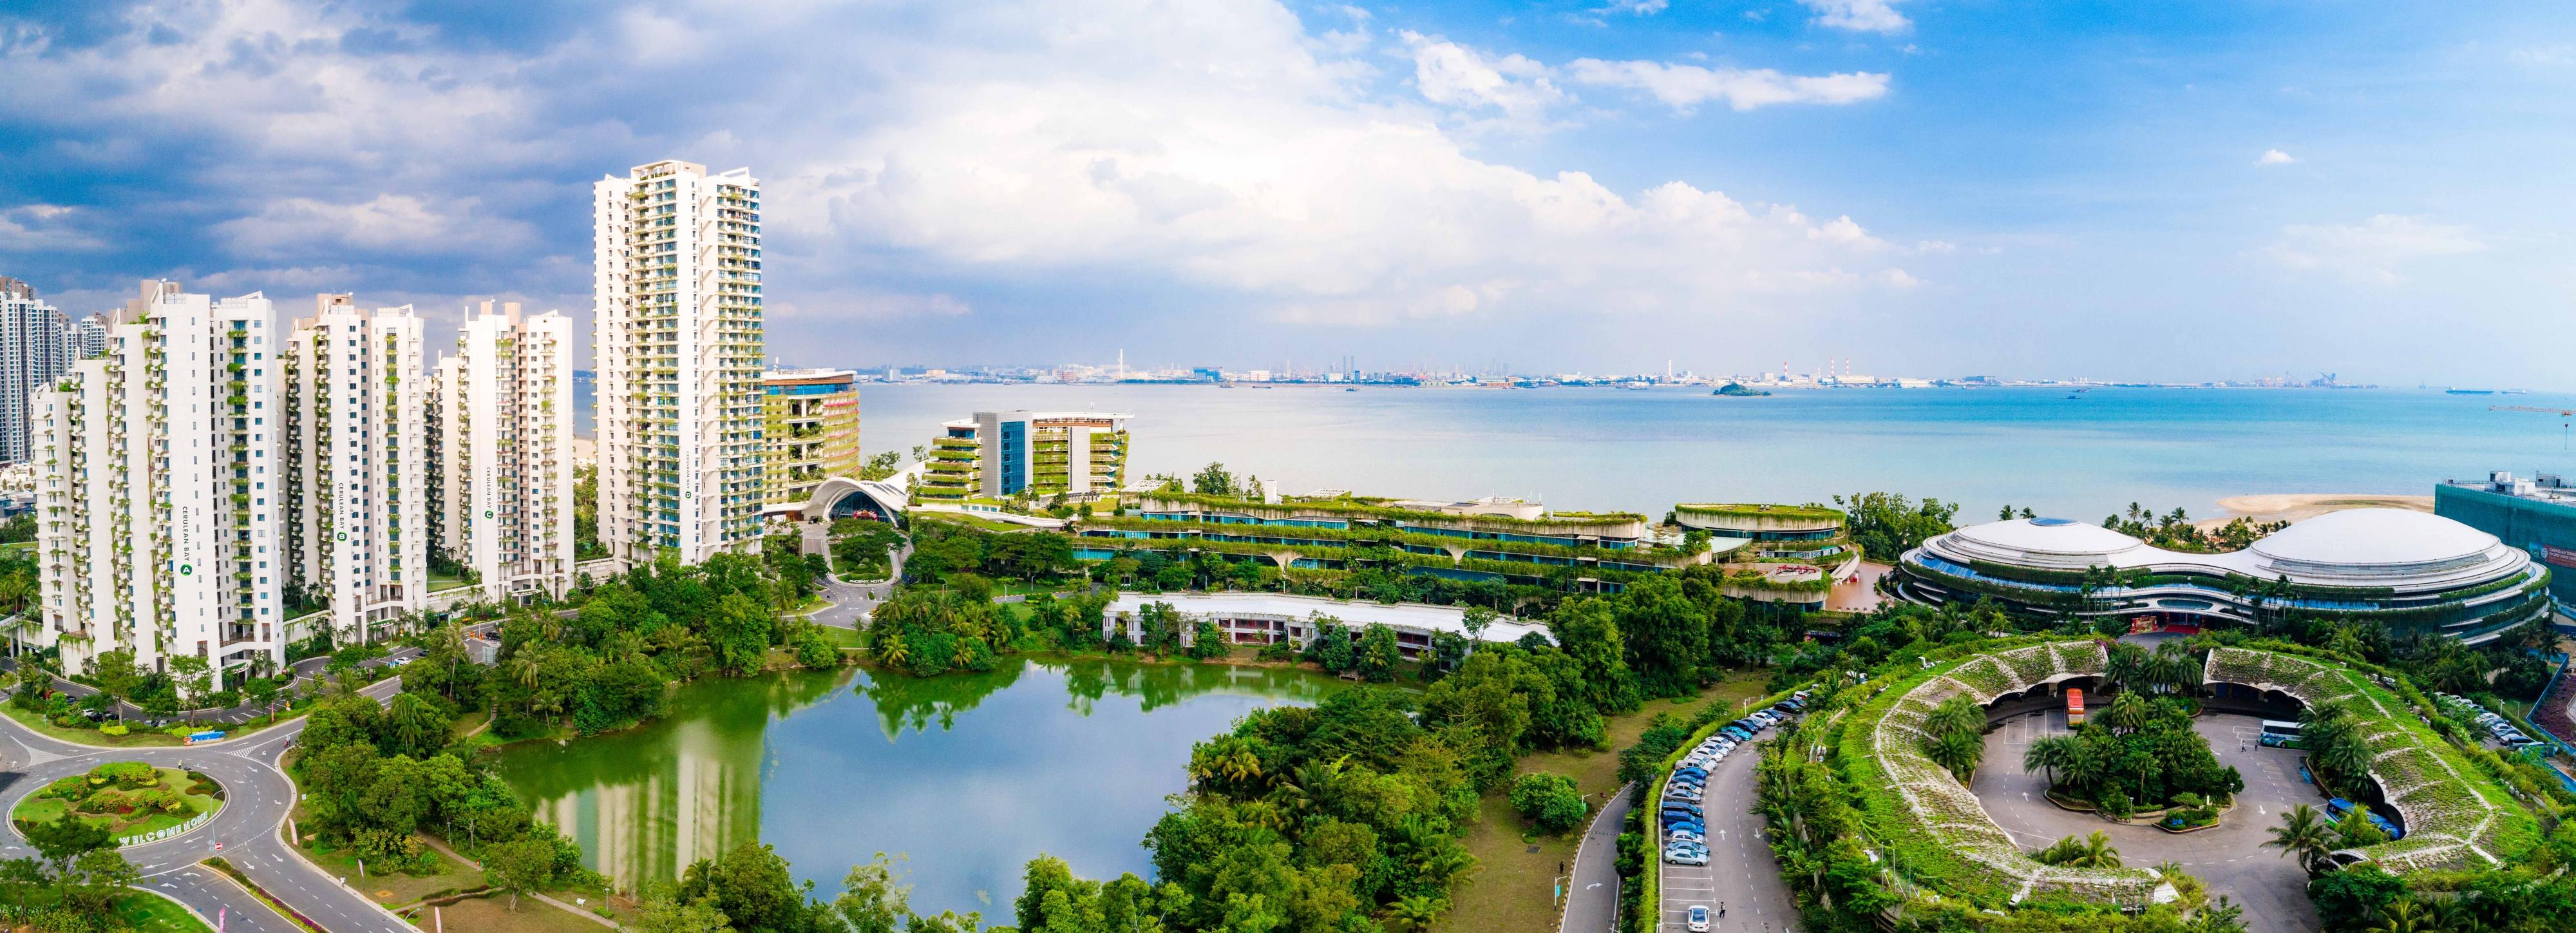 1.5 giờ bay trực tiếp từ HCMC sang Forest City